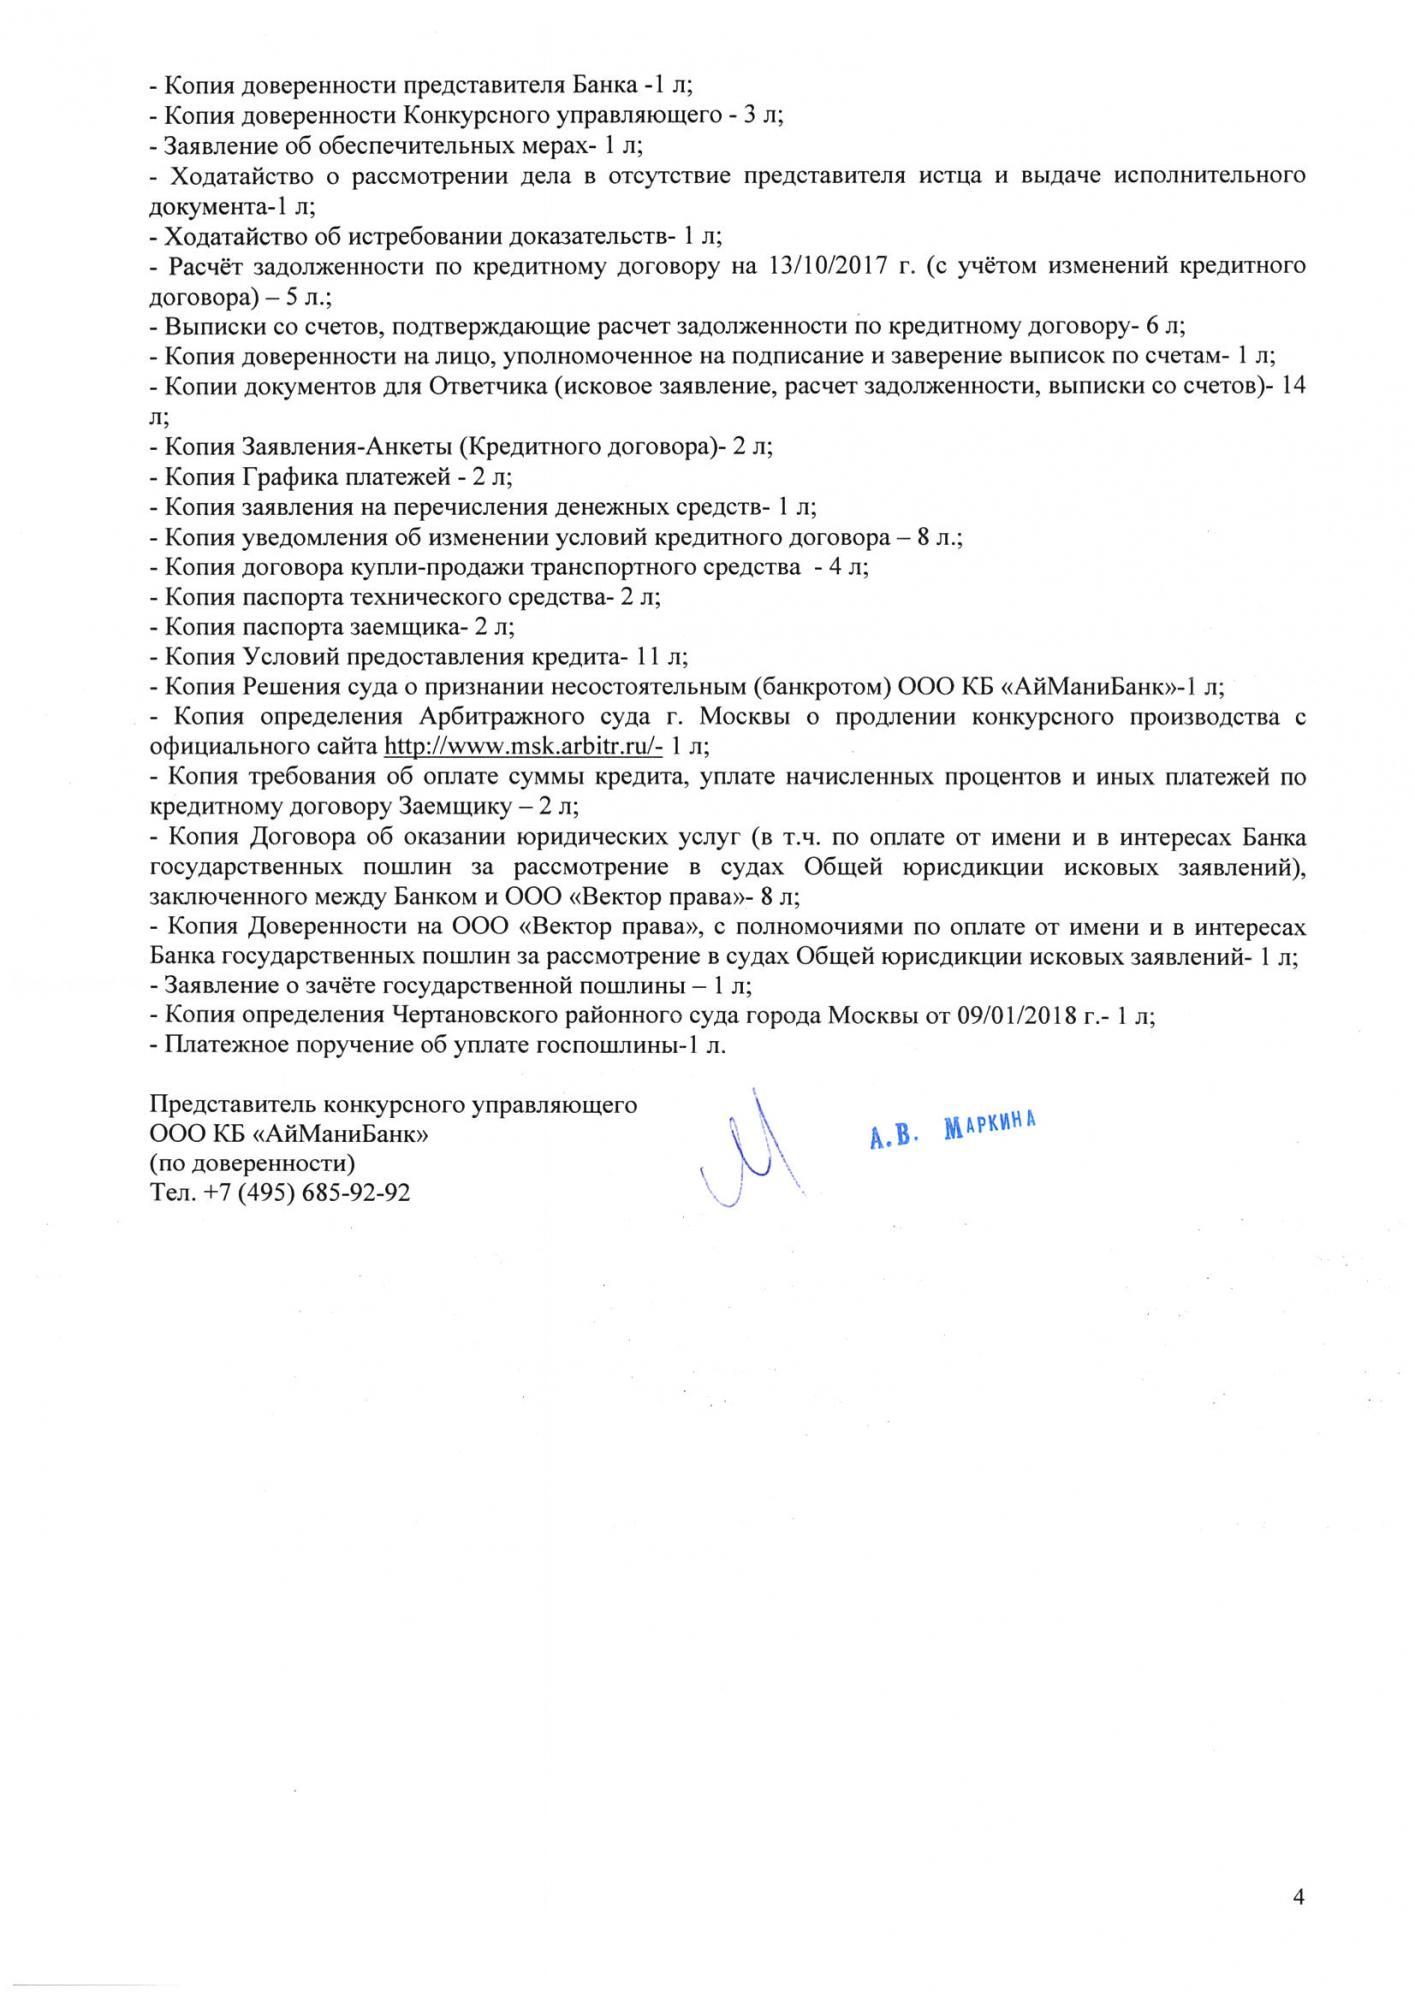 img-181018170133_Страница_03.jpg